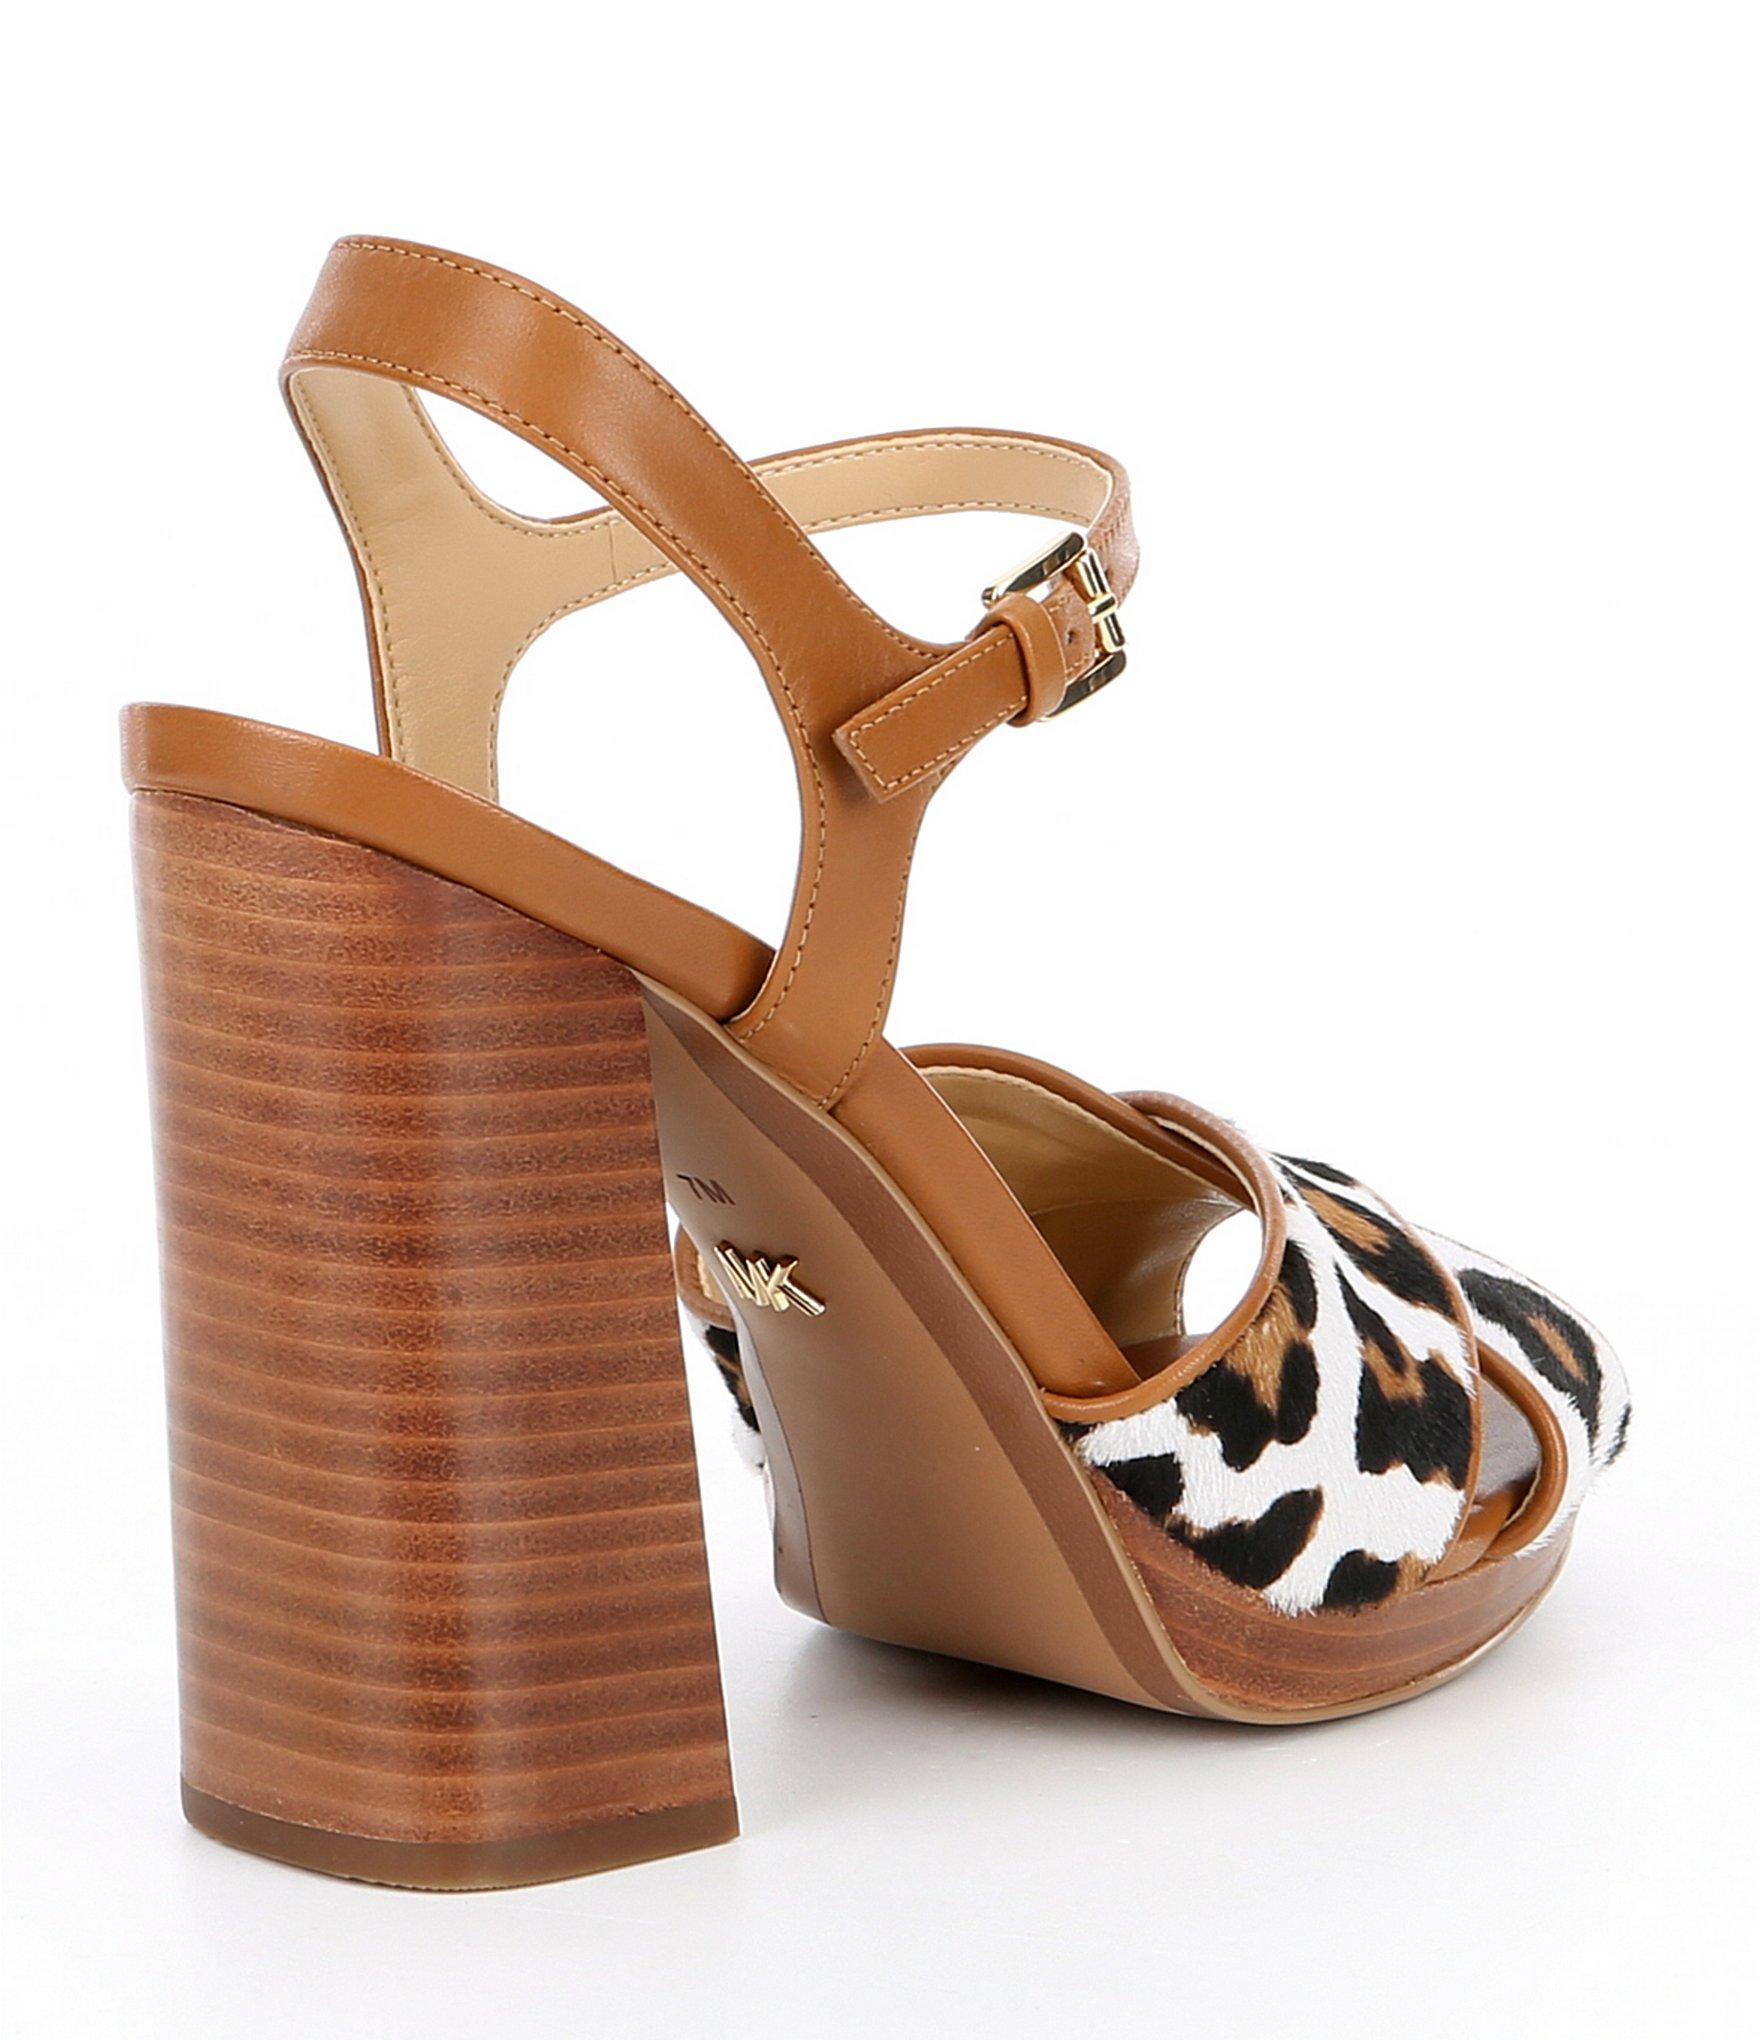 2b4691ba746d MICHAEL Michael Kors - Brown Alexia Leopard Print Platform Block Heel  Sandals - Lyst. View fullscreen